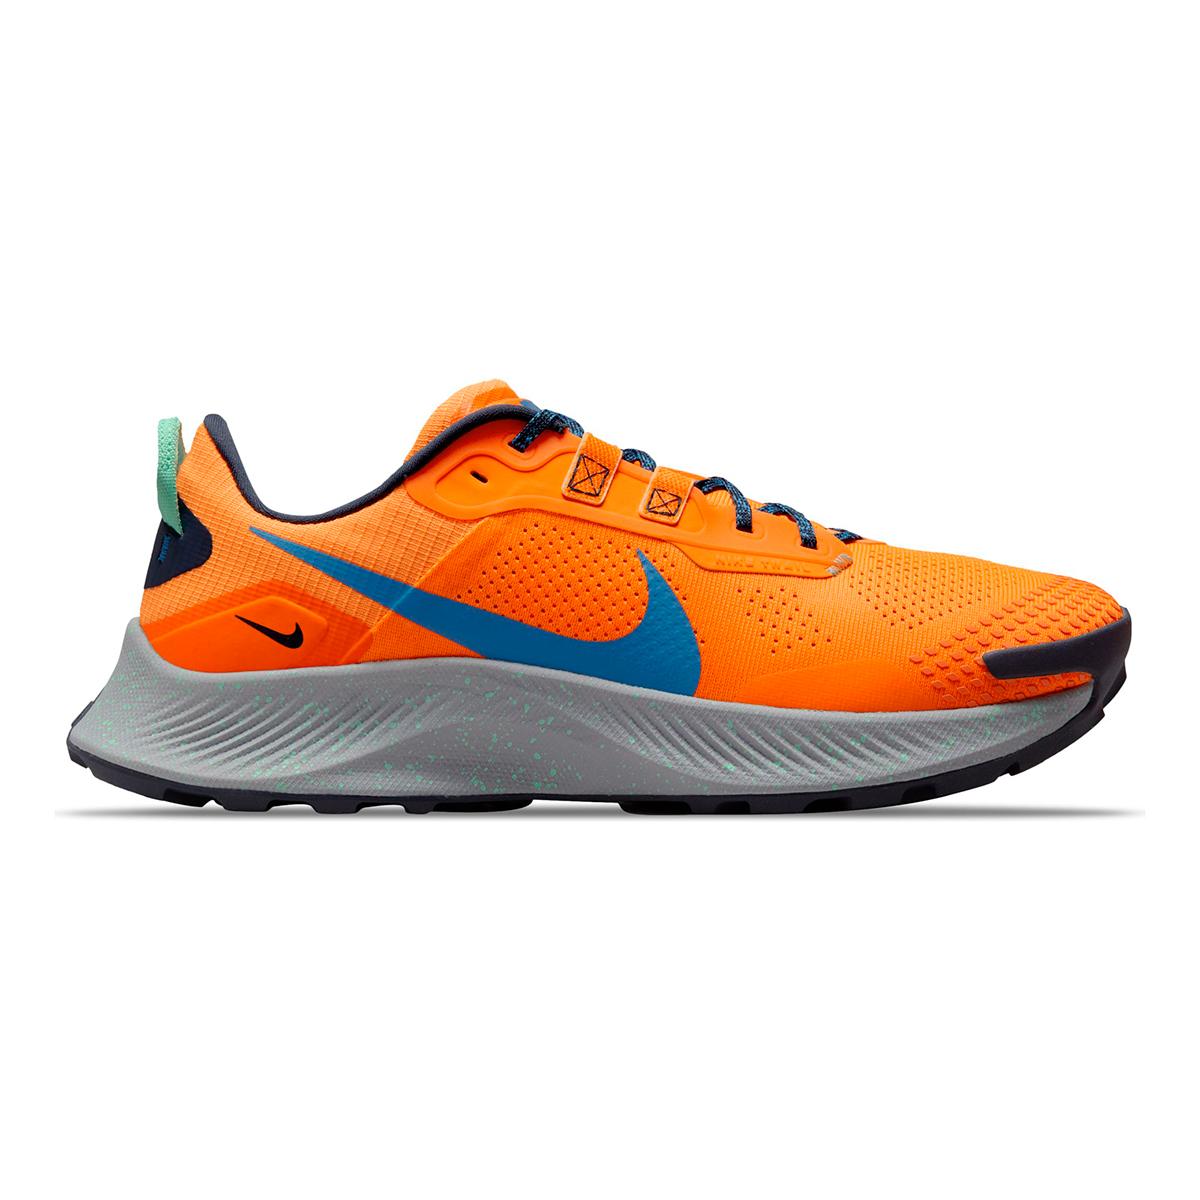 Men's Nike Pegasus Trail 3 Trail Running Shoe - Color: Total Orange/Signal Blue/Wolf Grey - Size: 6 - Width: Regular, Total Orange/Signal Blue/Wolf Grey, large, image 1